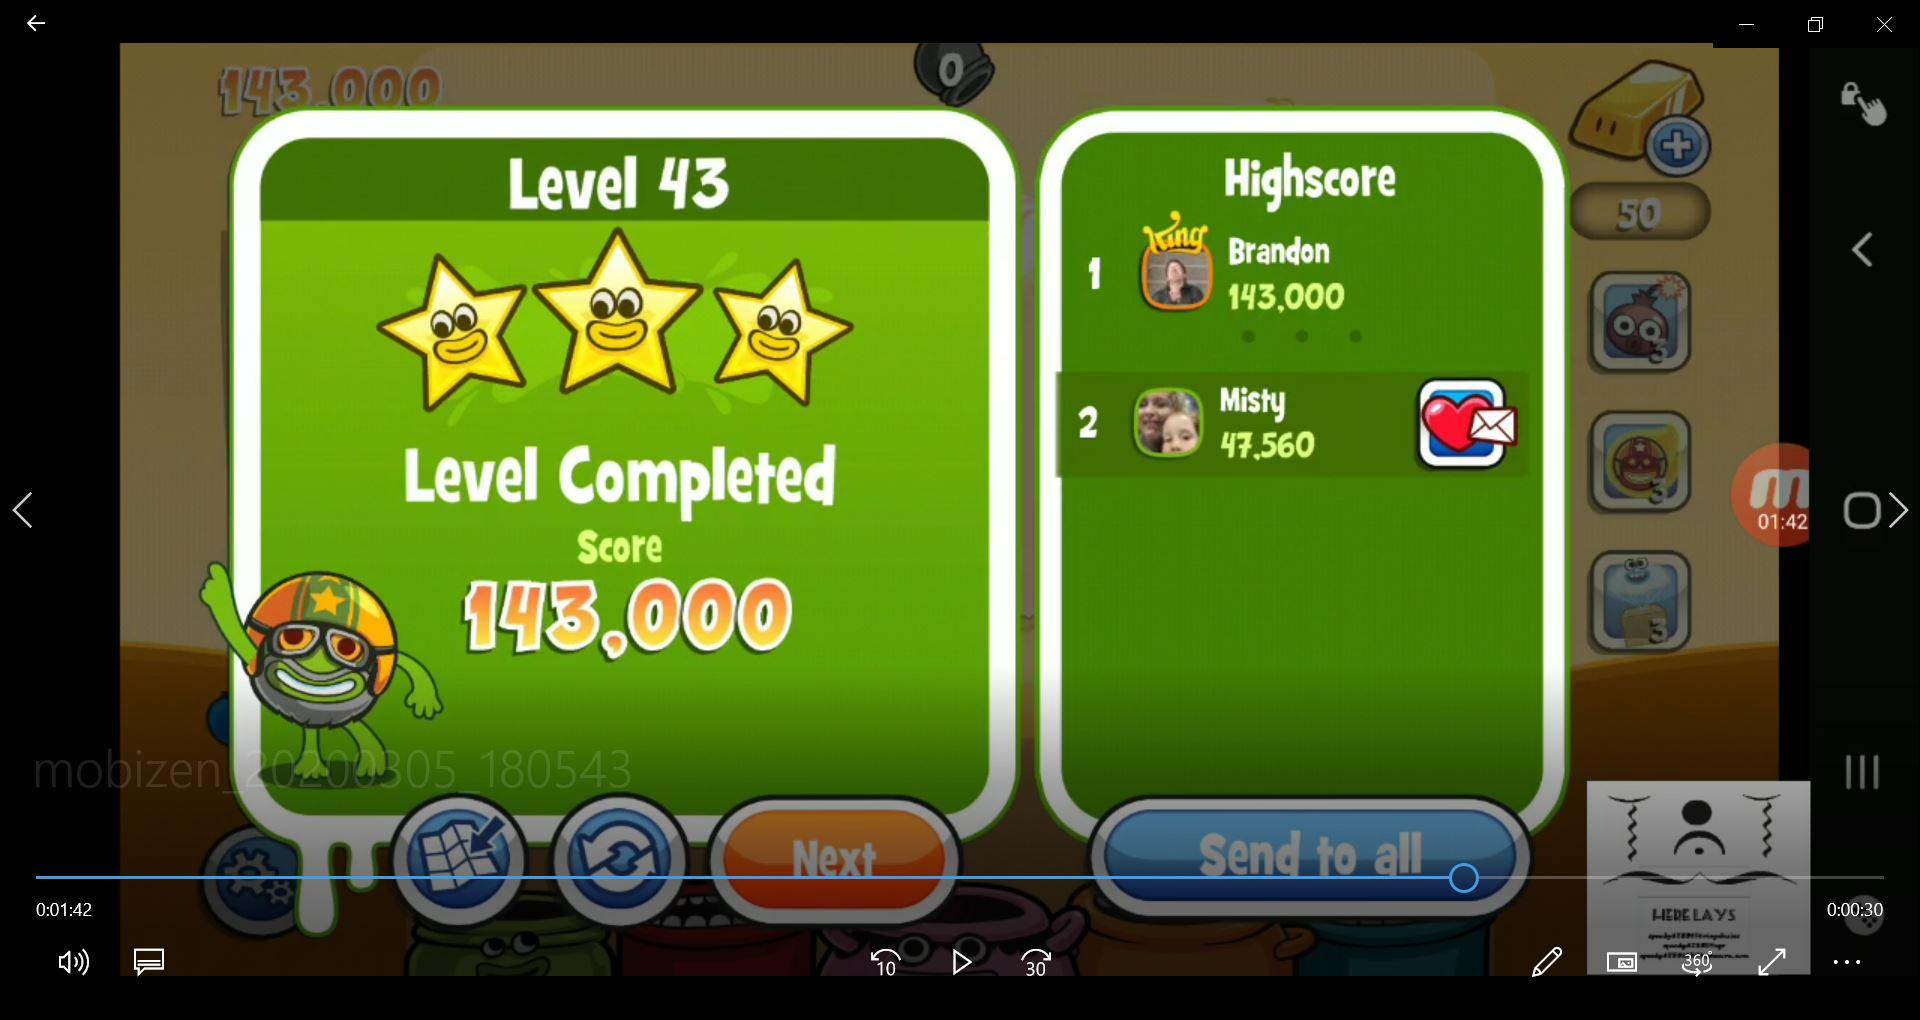 speedy4759123: Papa Pear Saga: Level 043 (Android) 143,000 points on 2020-03-07 06:08:16